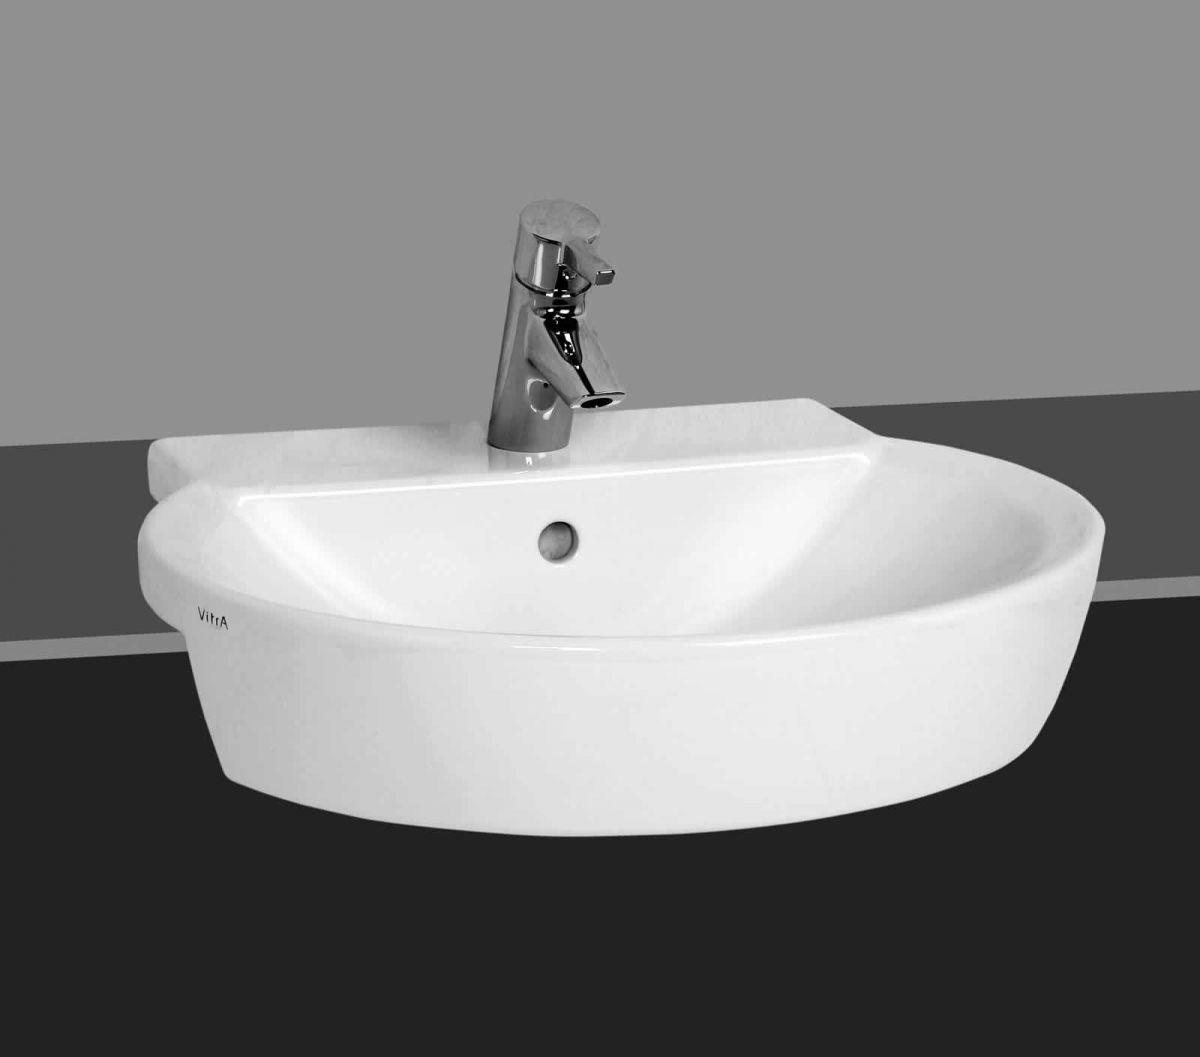 Vitra Sunrise Semi Recessed Basin Uk Bathrooms